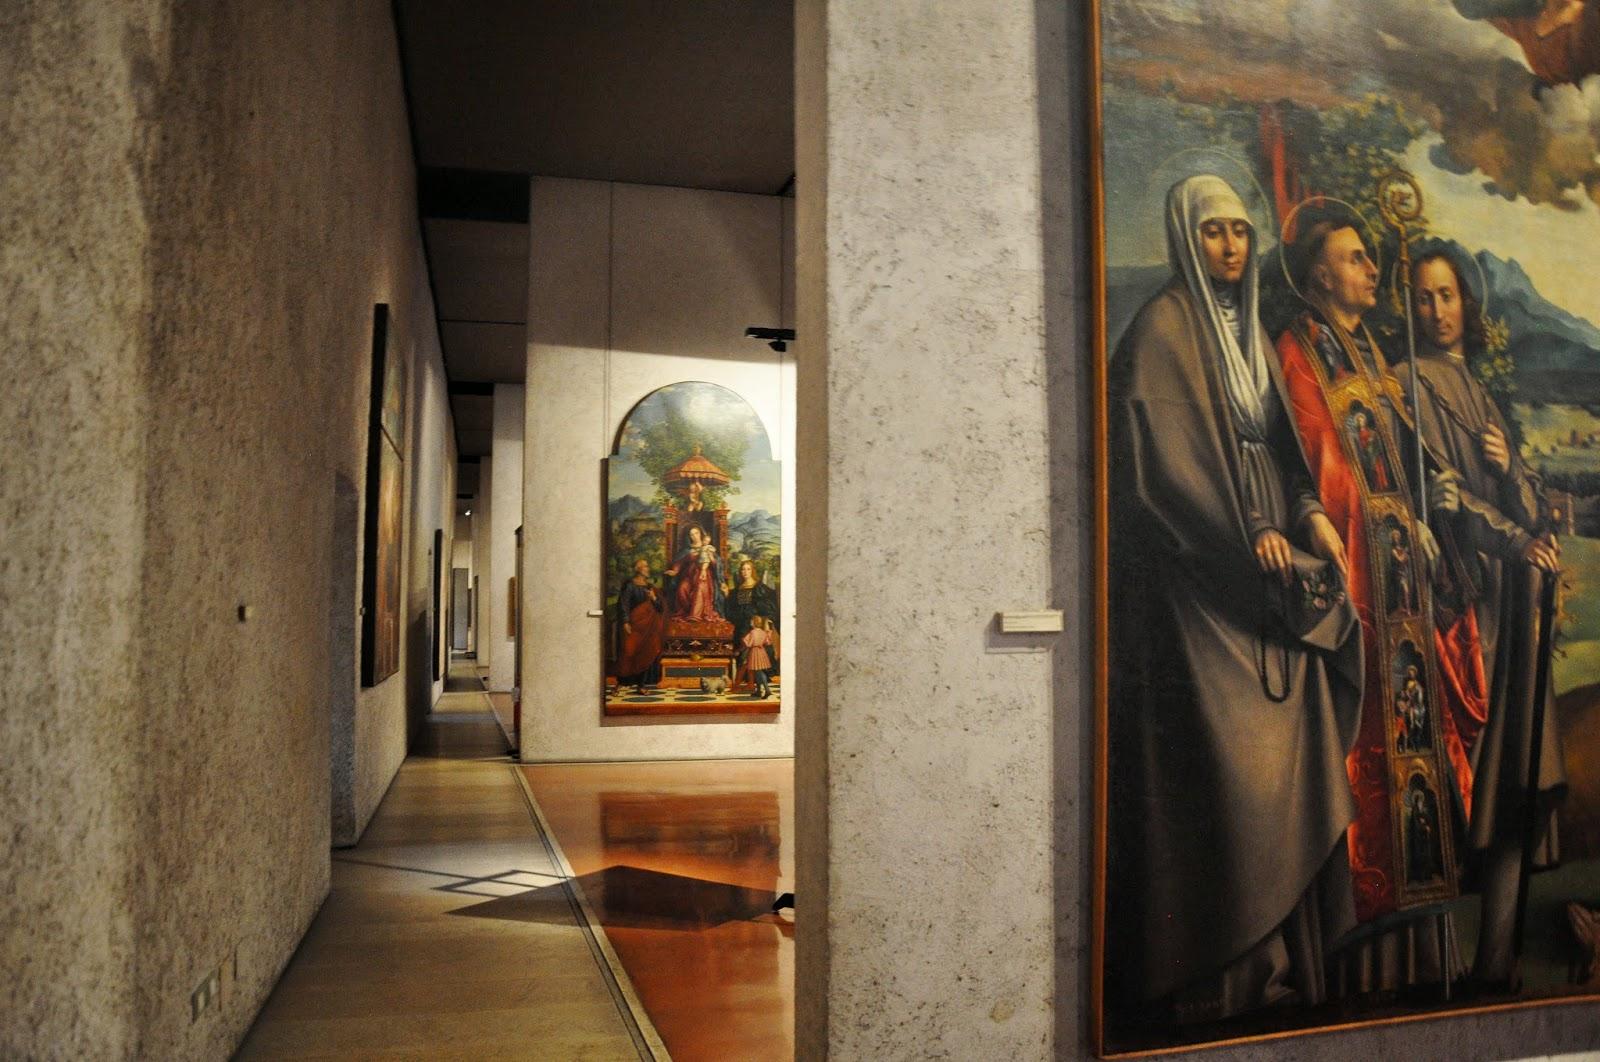 The art gallery of the Museum of Castelvecchio in Verona